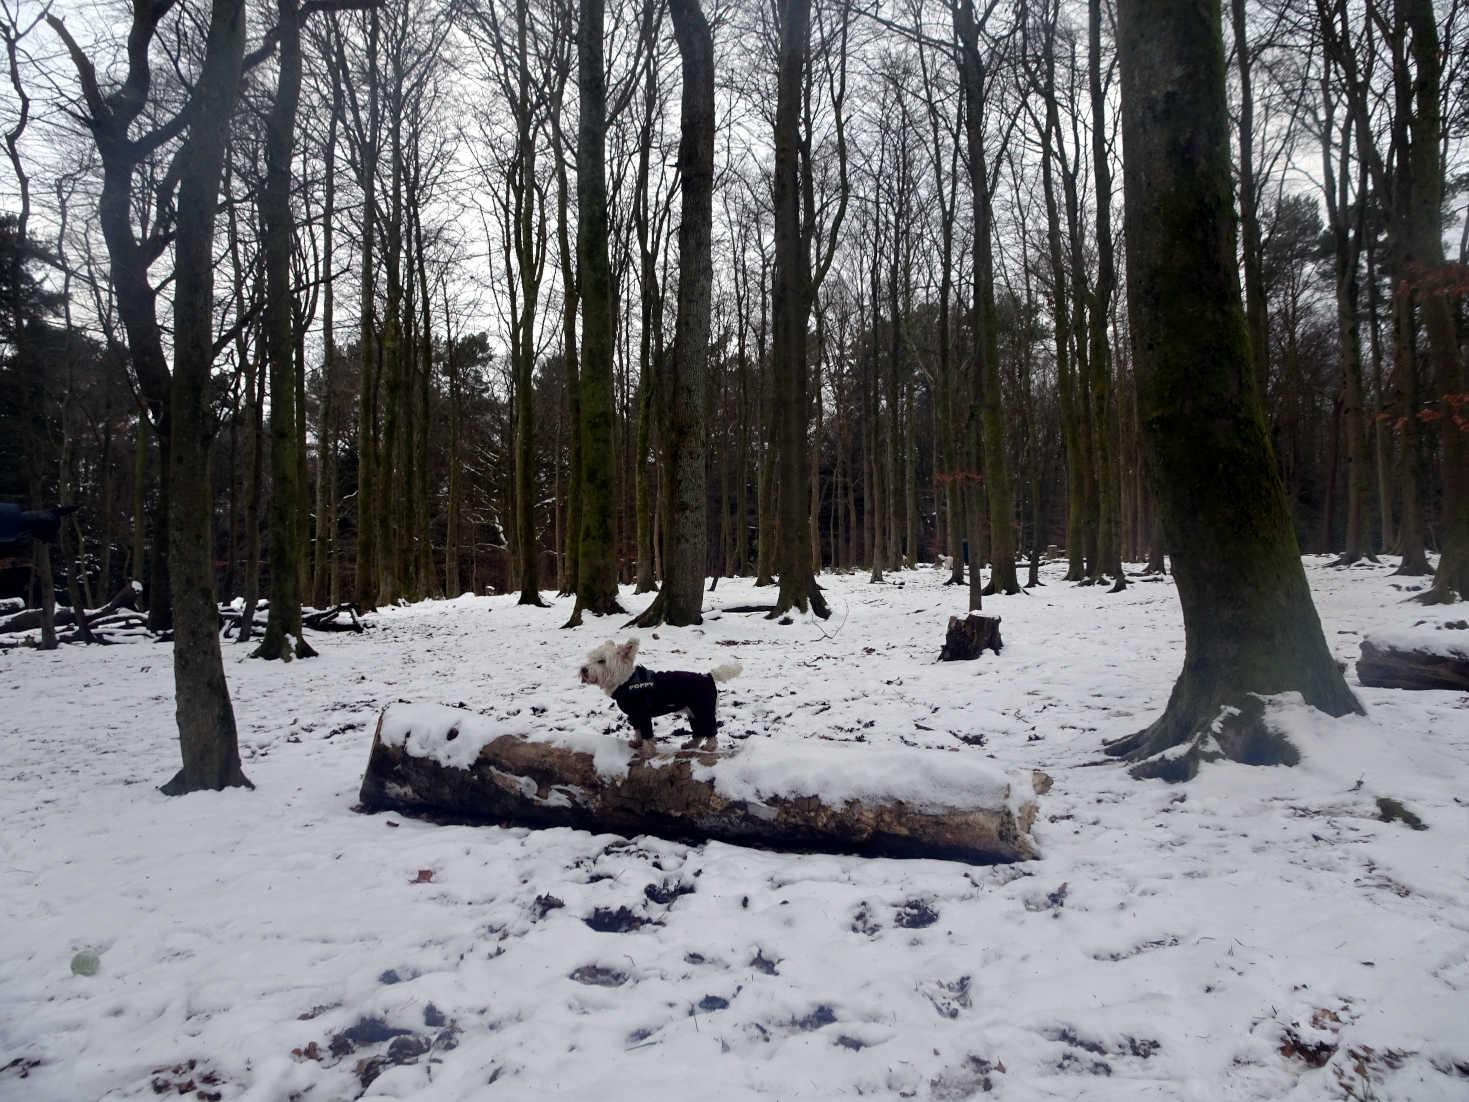 poppy the westie on snowy log pollock park